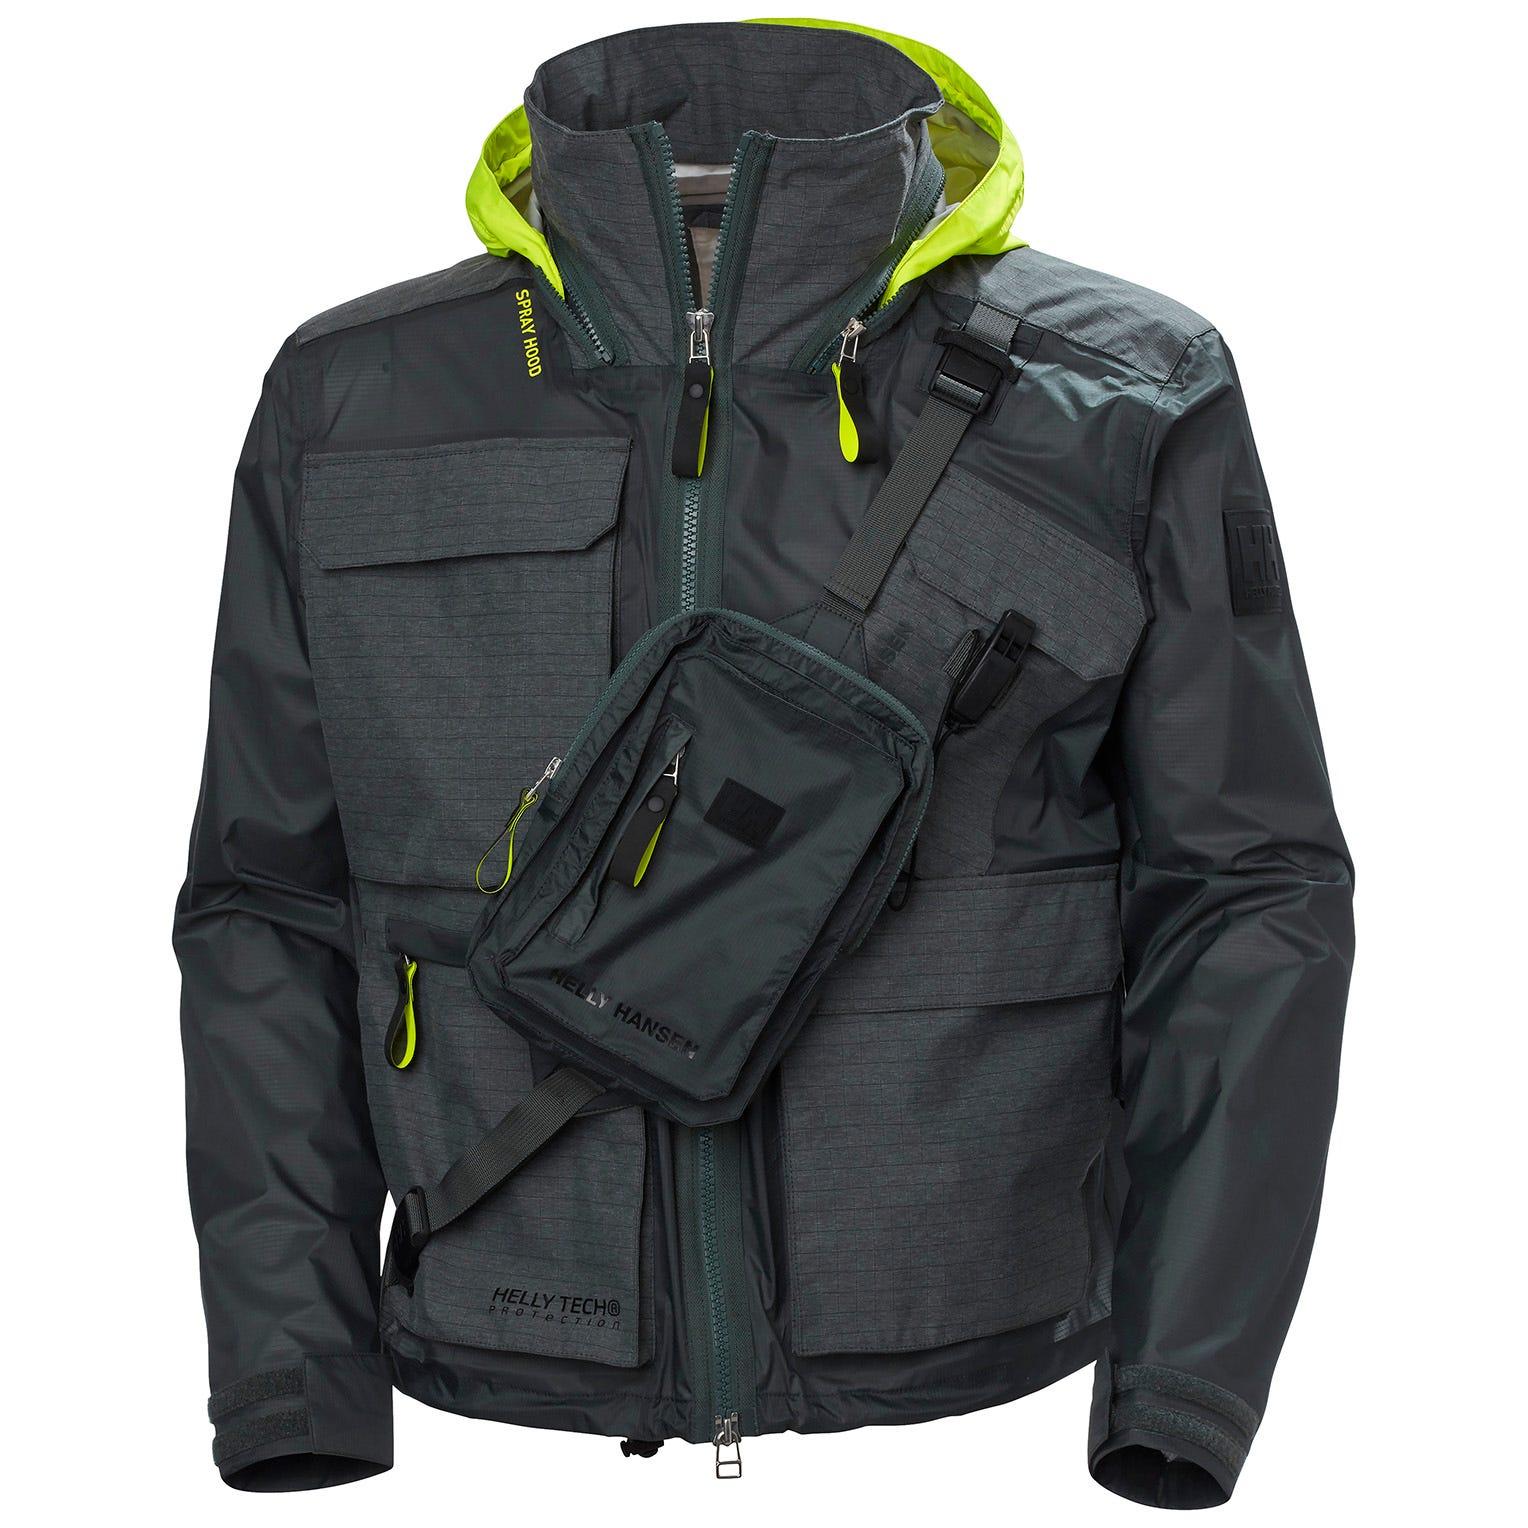 Helly Hansen Mens Hh Arc S21 Ocean 3l Waterproof Jacket XS